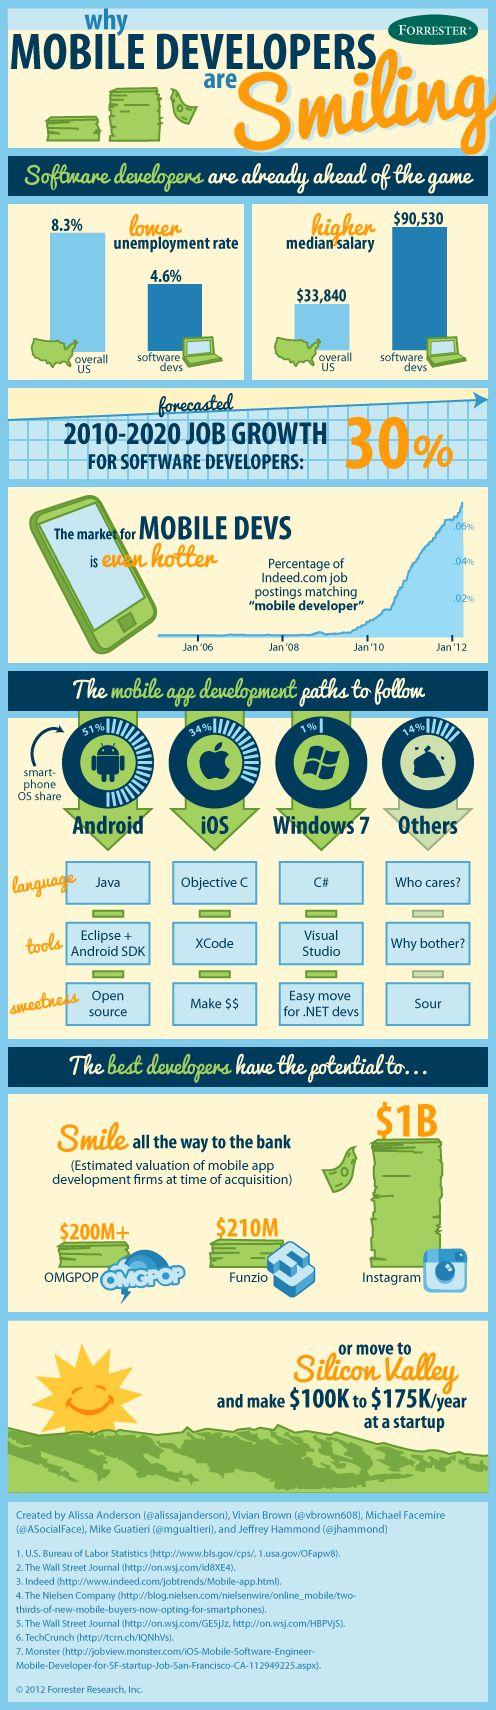 Результат поиска Google для https://s3.amazonaws.com/ForresterTechnoPolitics/Forrester_Infographic_Why_Mobile_App_Developers_Are_Smiling.png